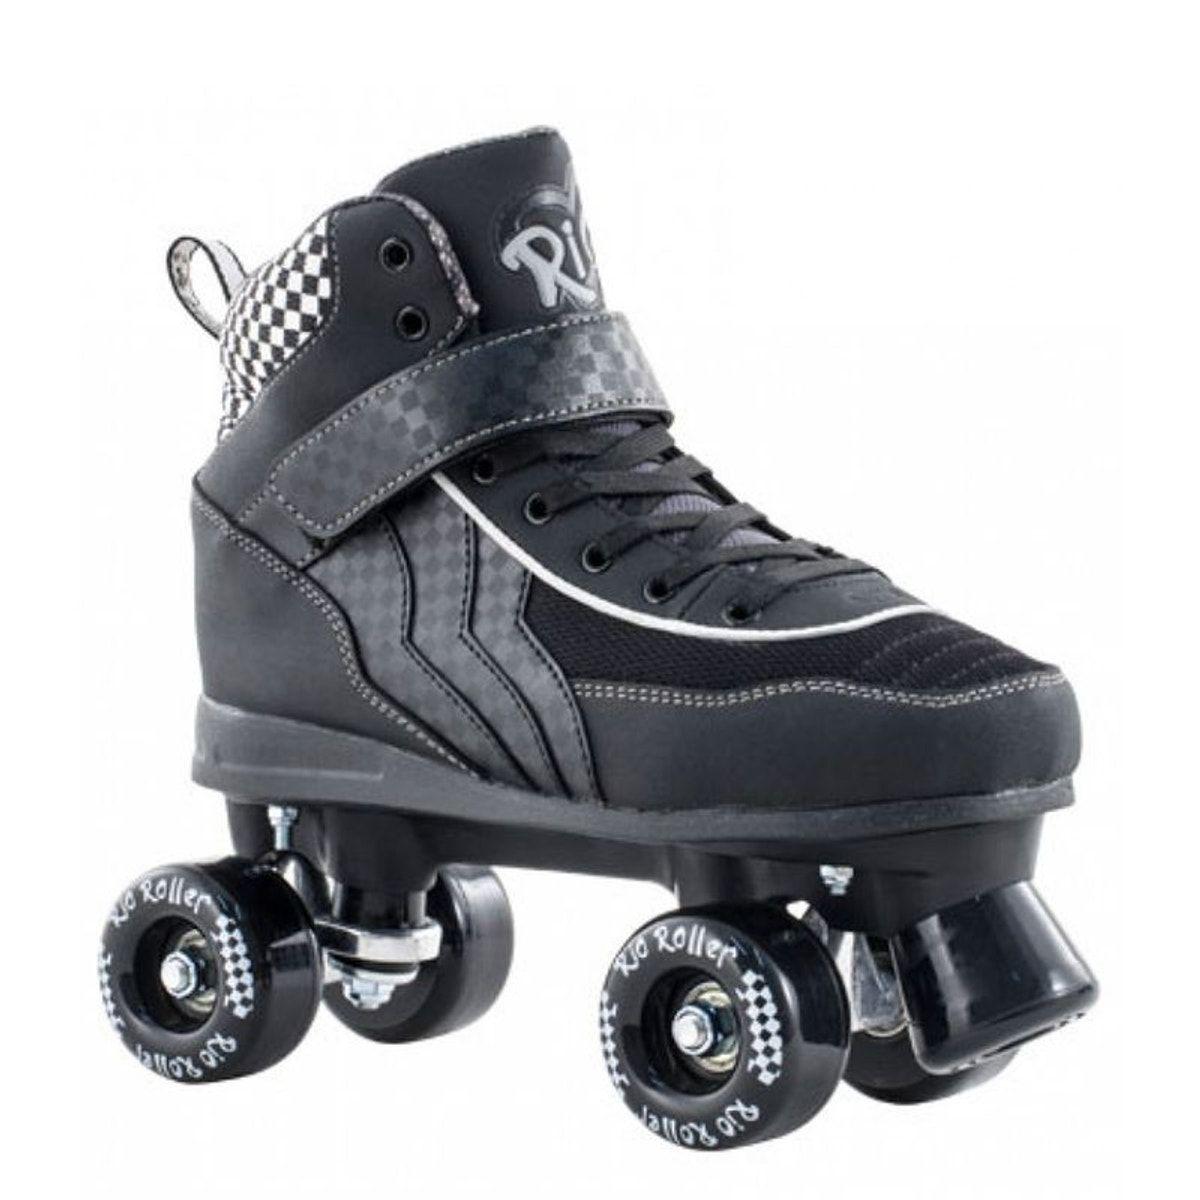 SFR /à Glace//Roller Skate Sac de Transport